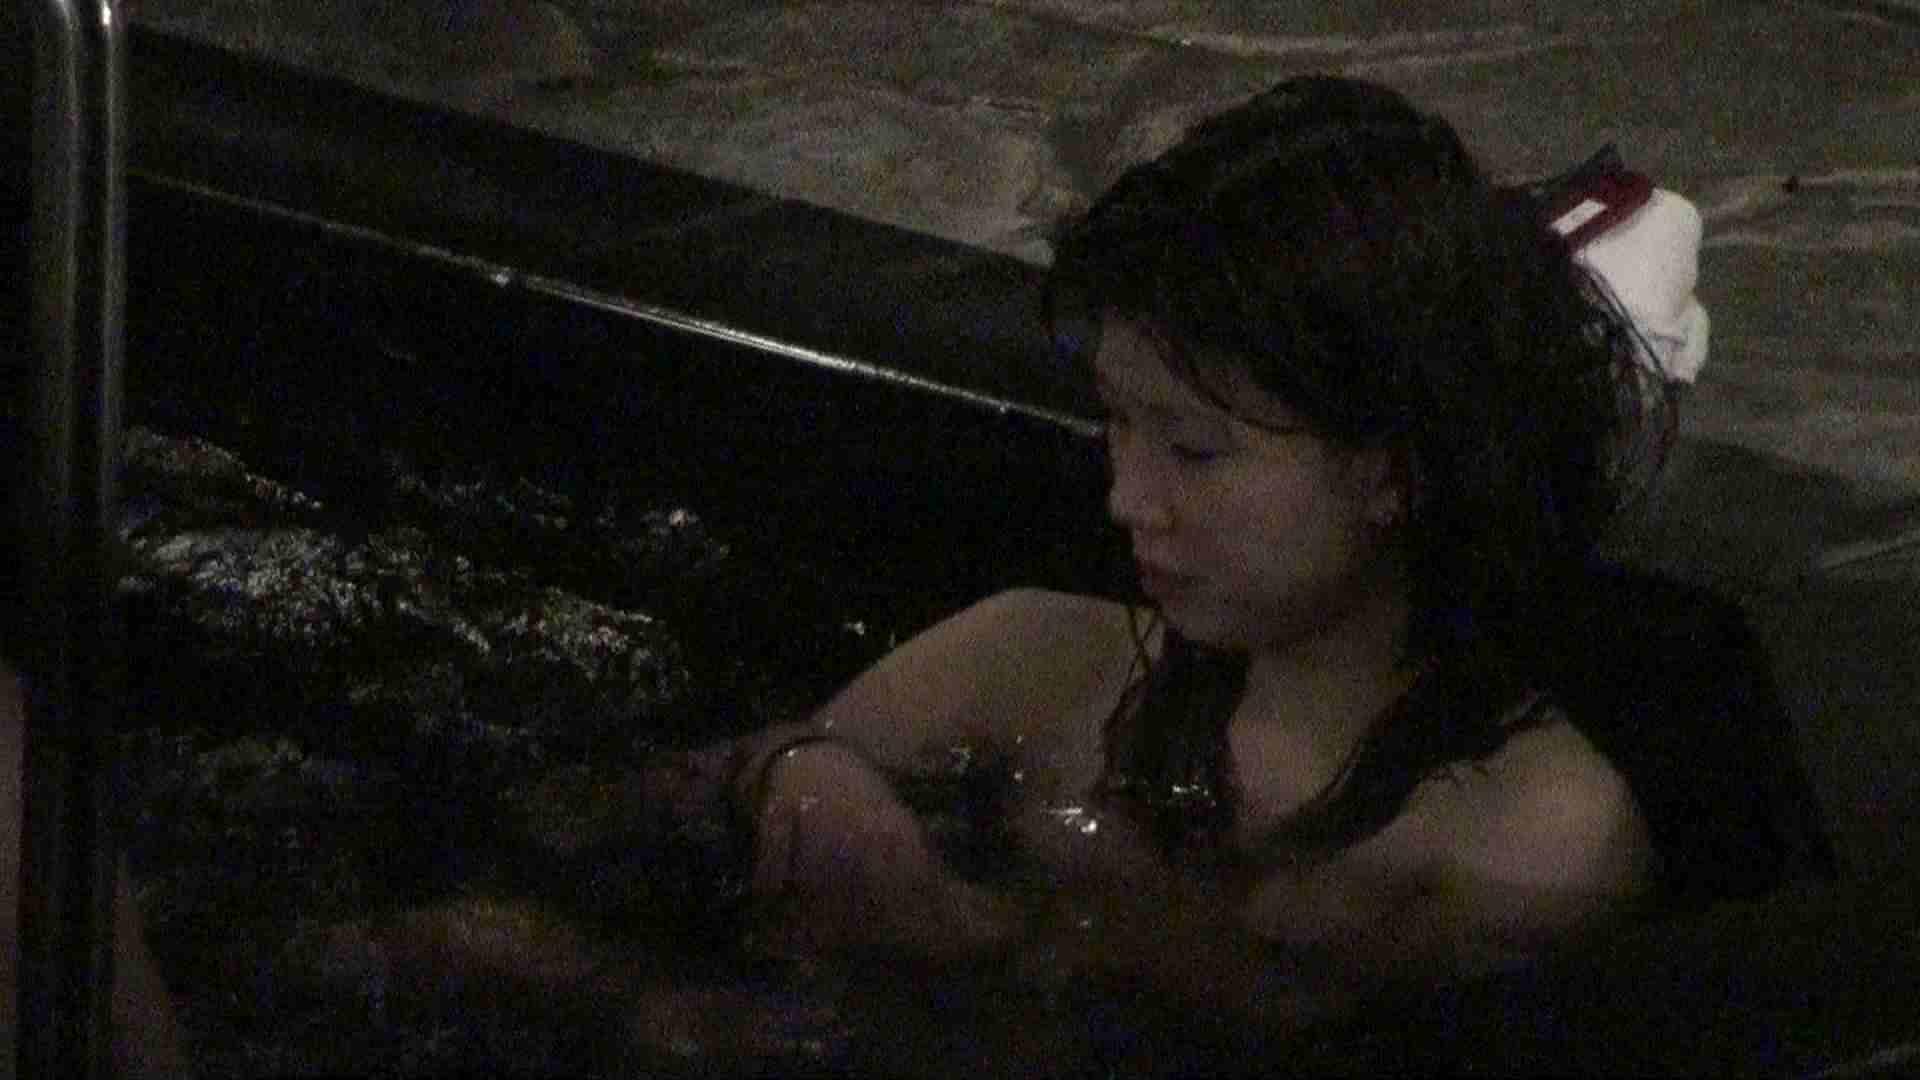 Aquaな露天風呂Vol.371 盗撮大放出 性交動画流出 92連発 88